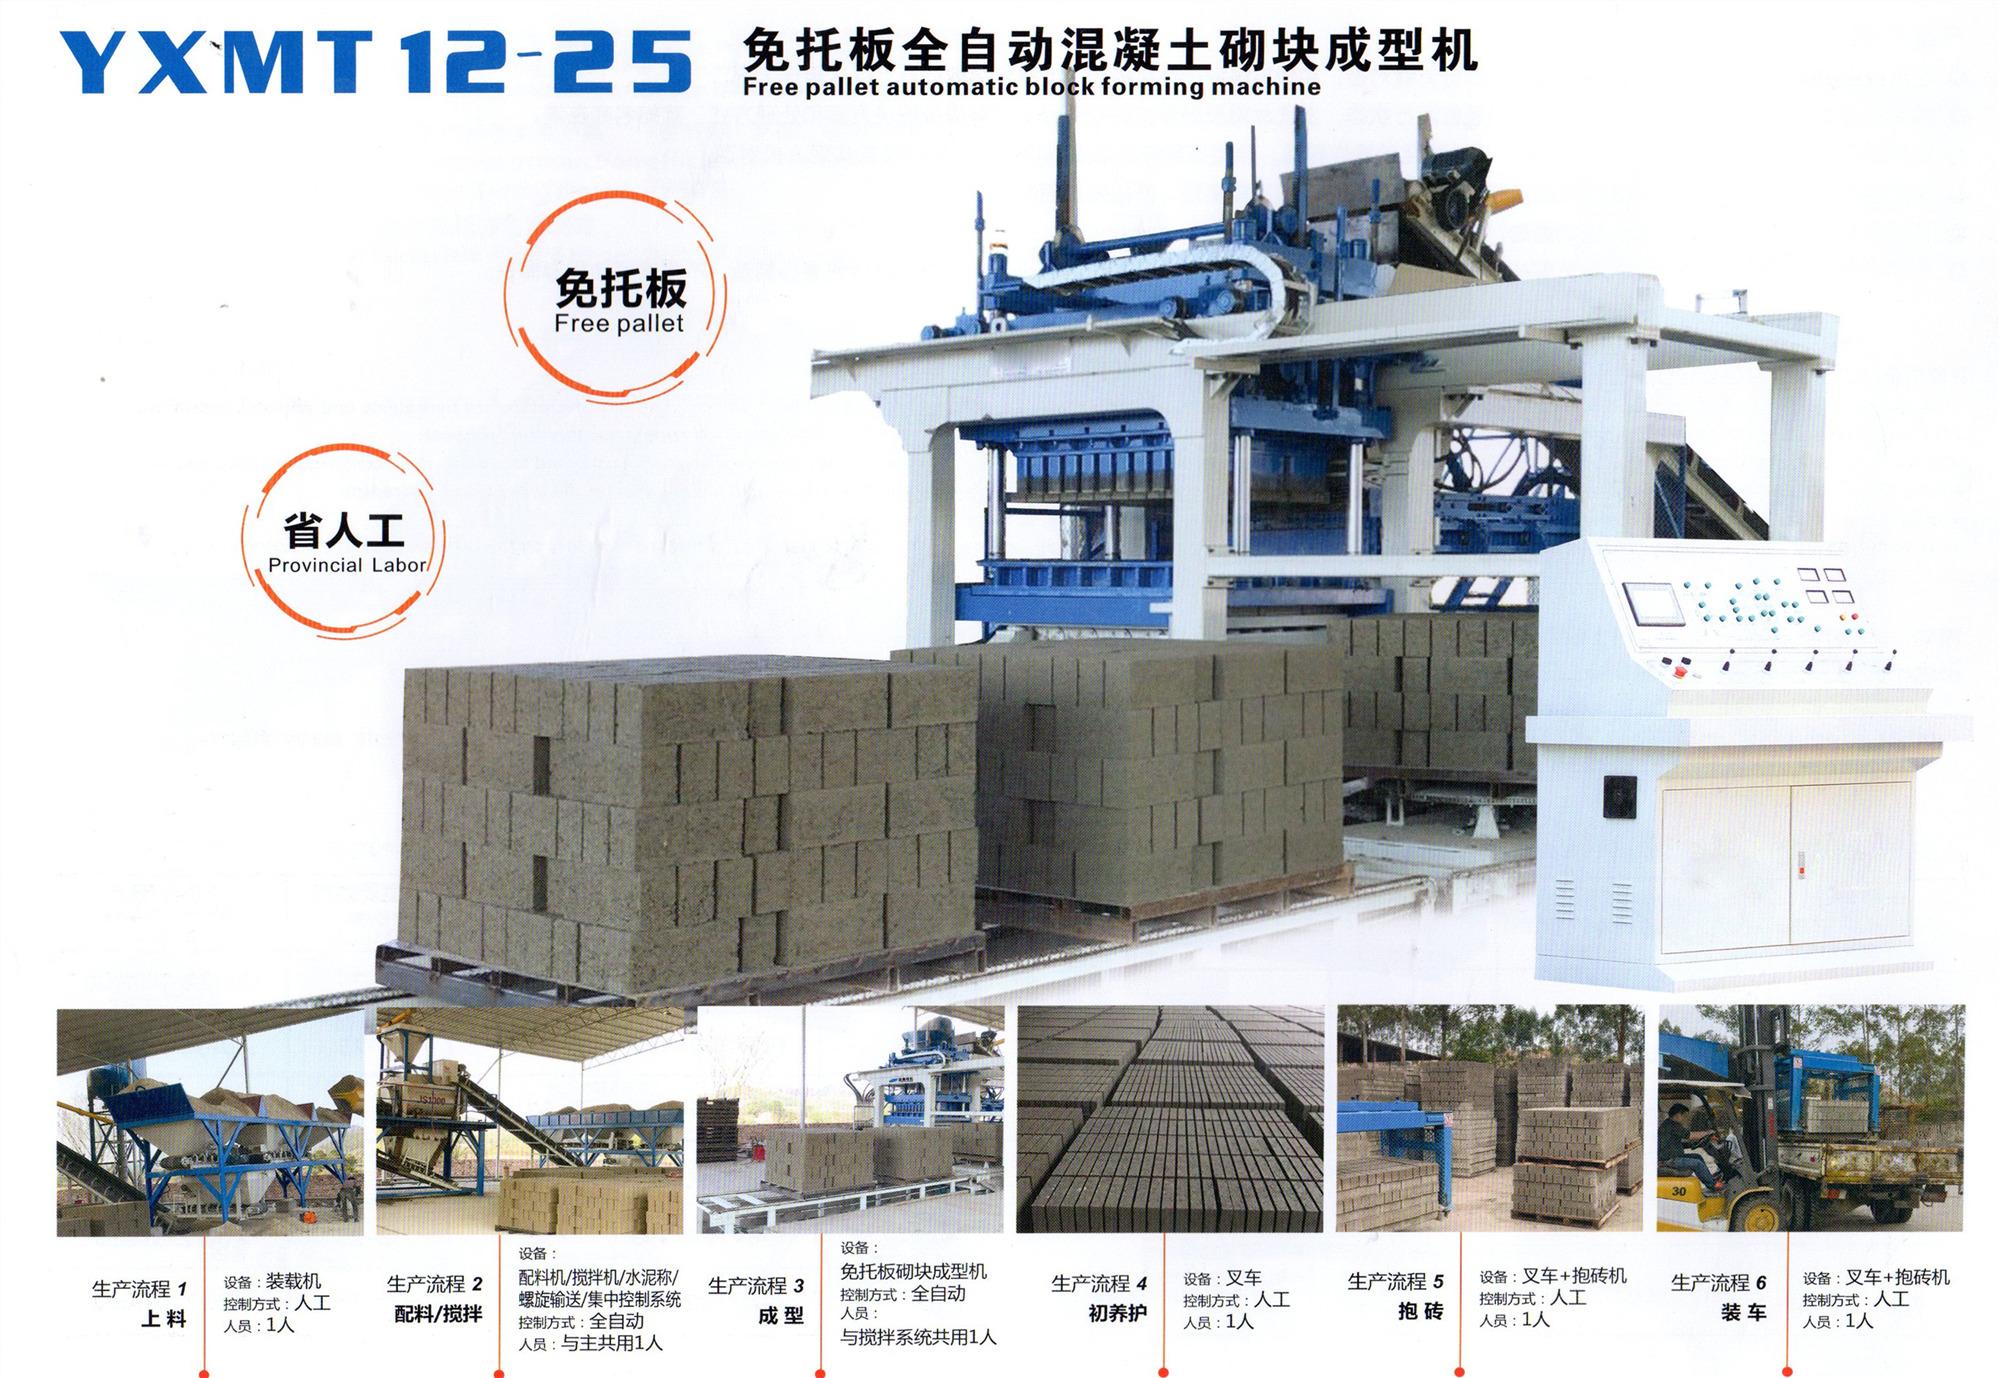 YXMT12-25 免托板全自动混凝土砌块成型机